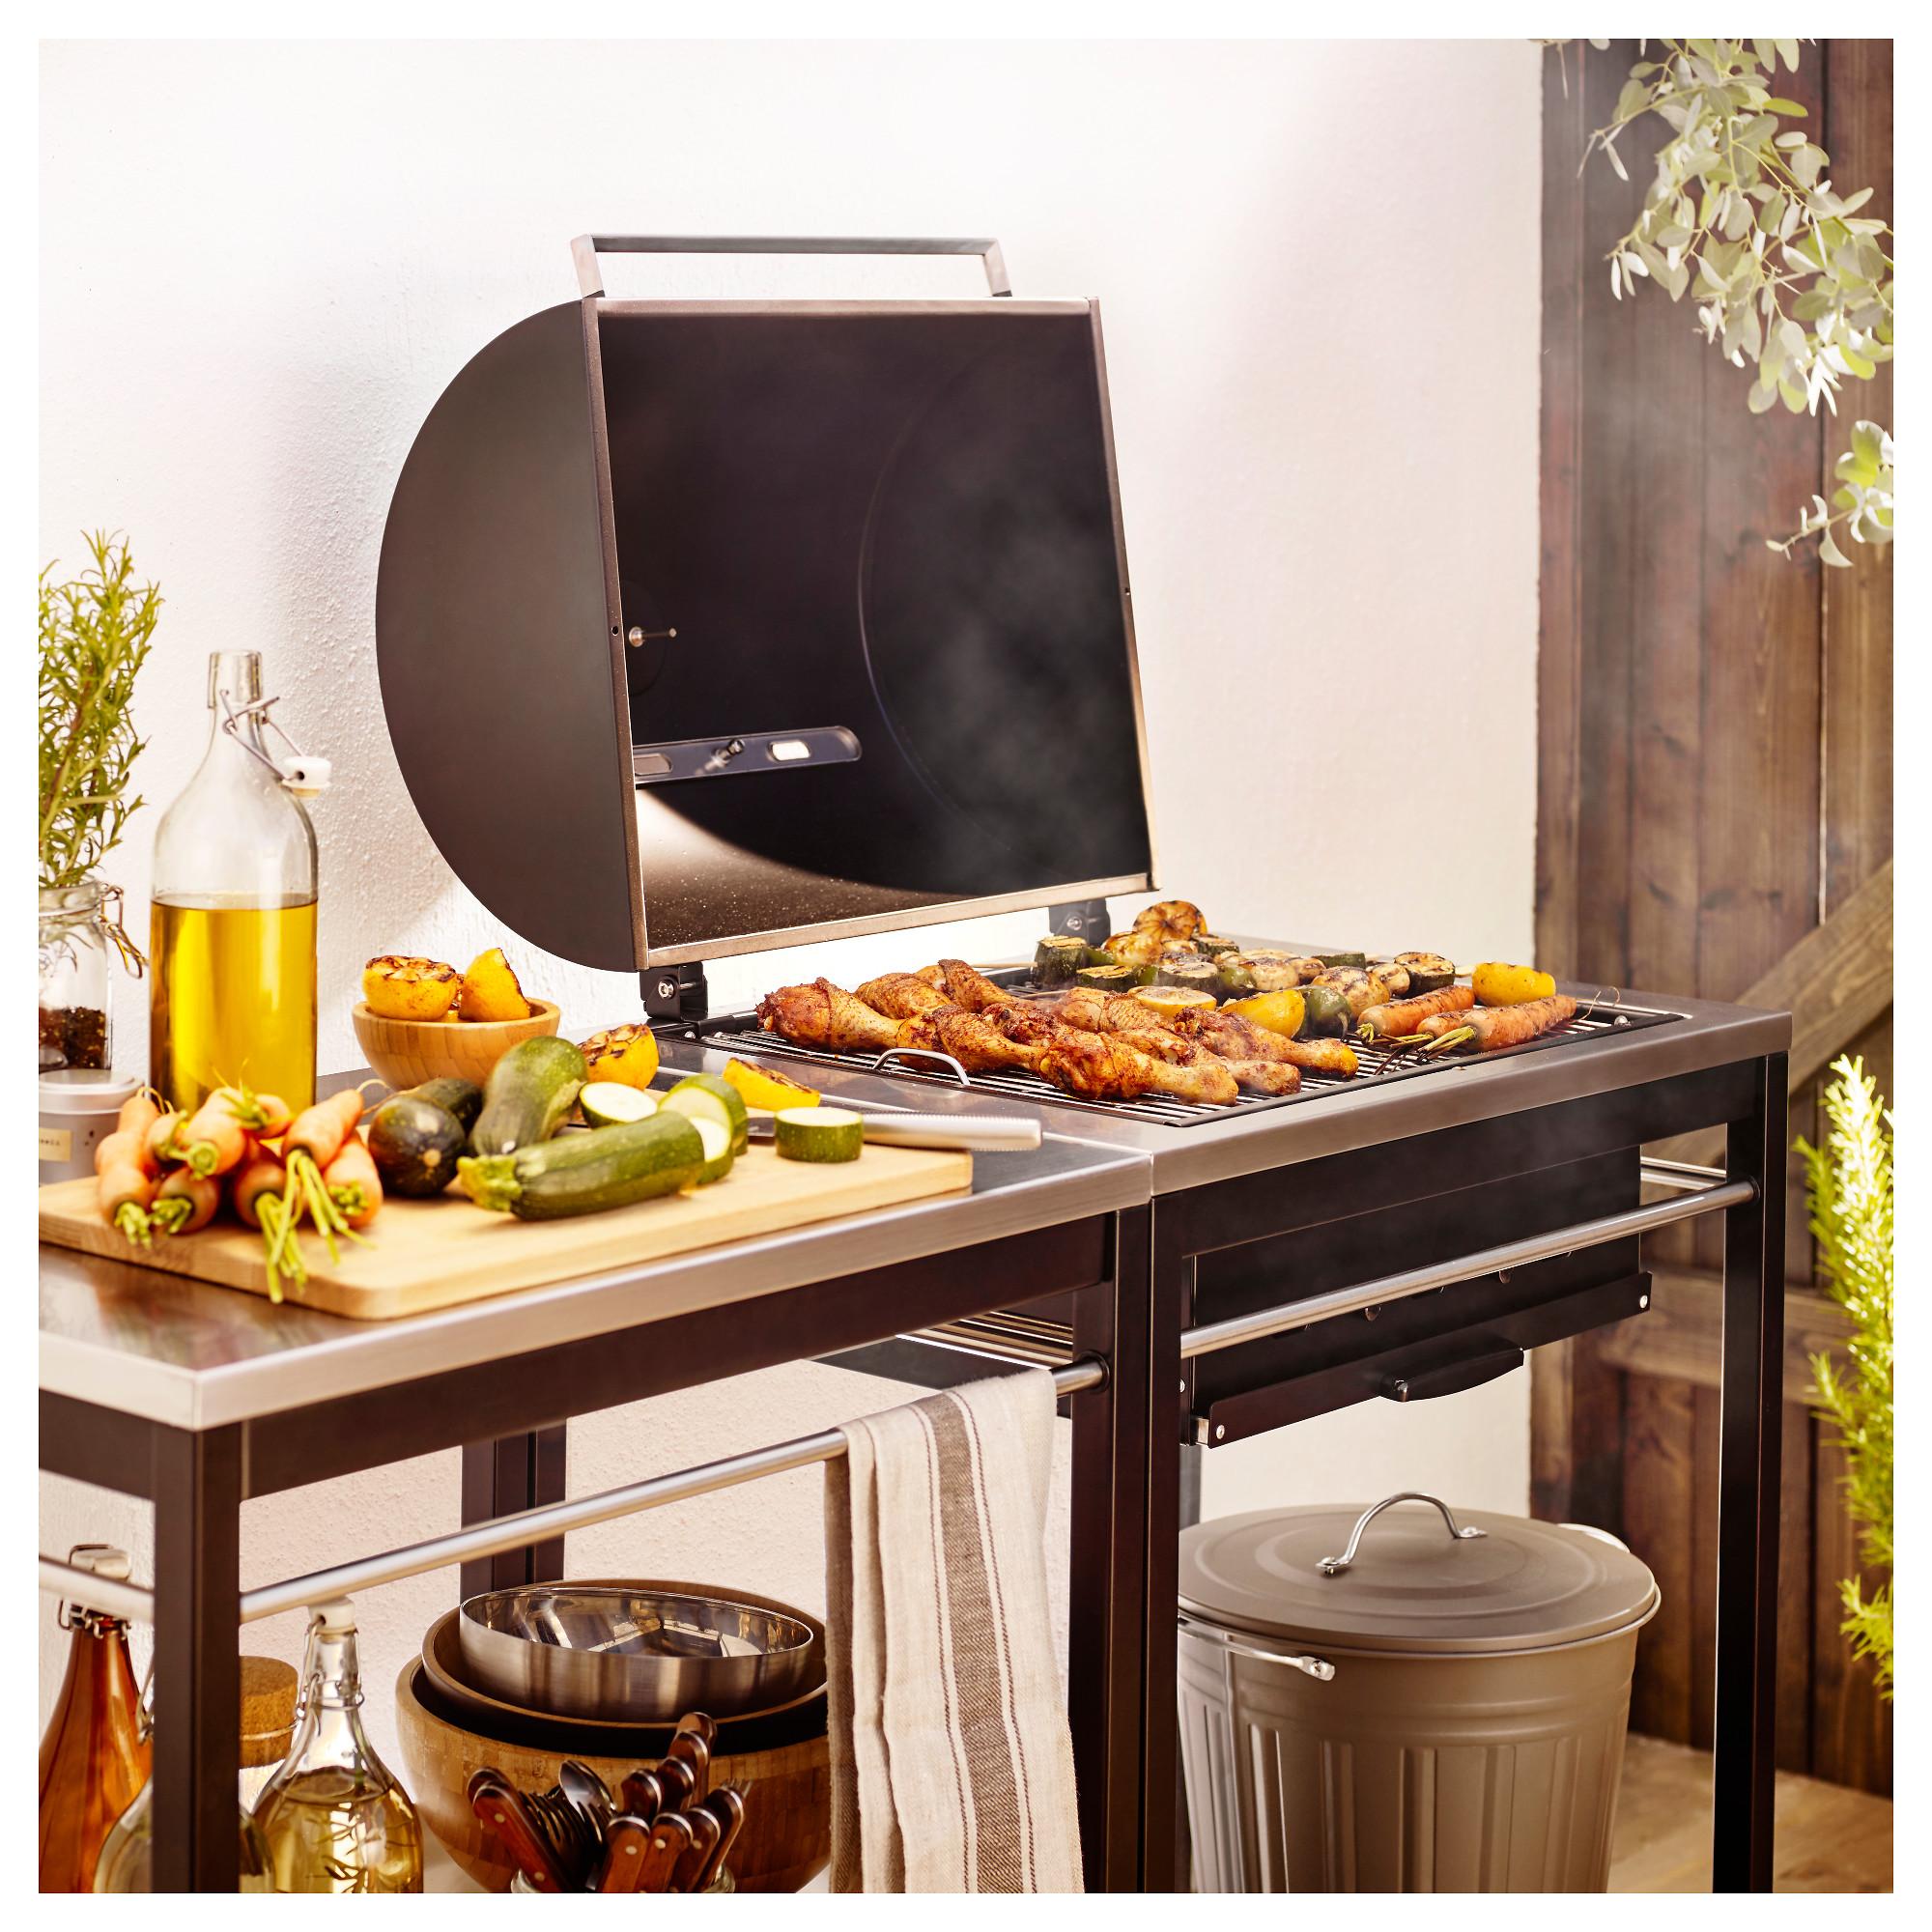 Poser Sa Cuisine Ikea ikea estonia - shop for furniture, lighting, home